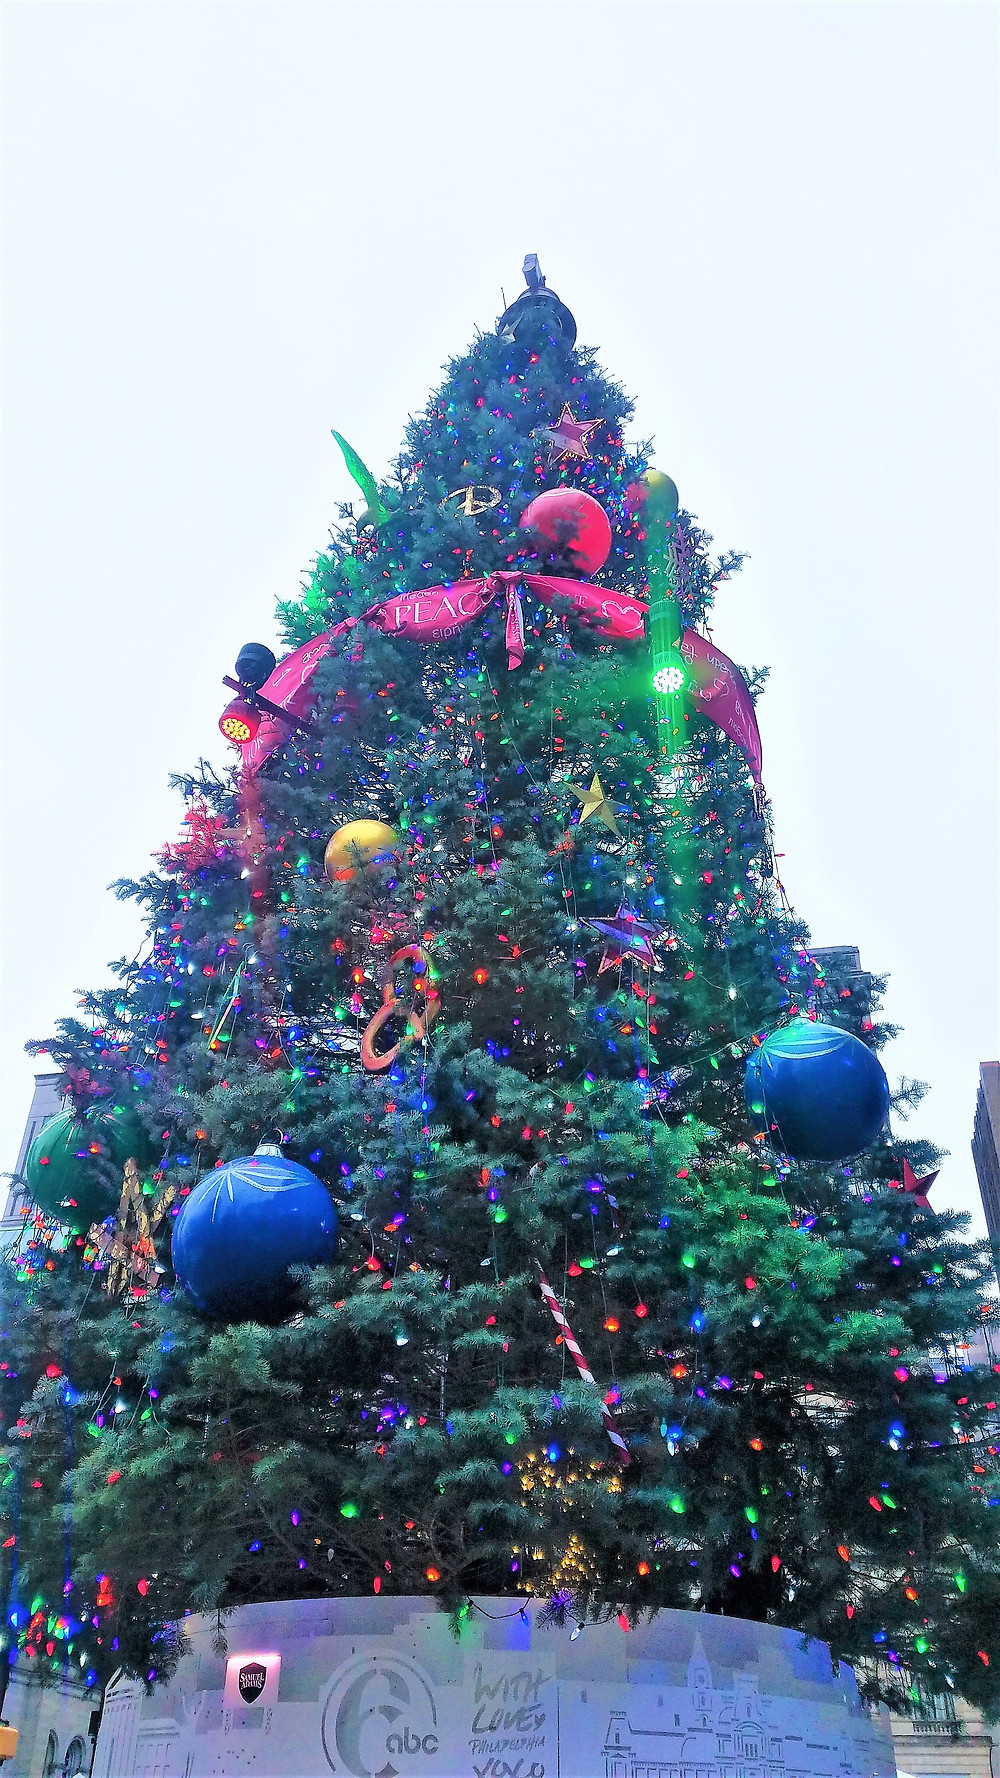 Traveleioscope:  Christmas Tree, City Hall, Philadelphia